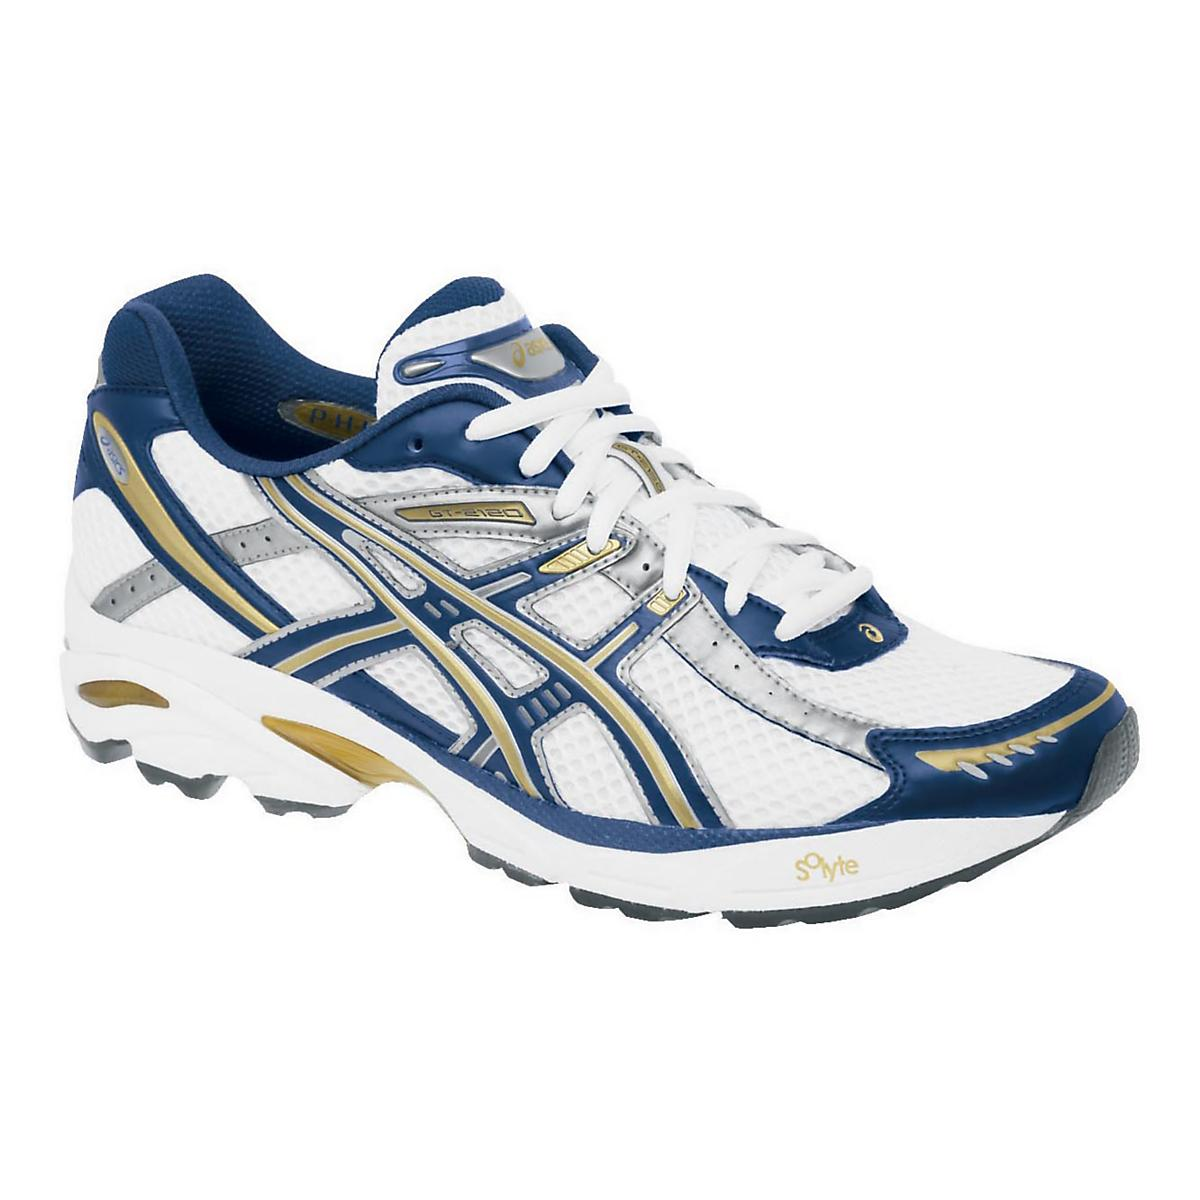 Mens ASICS GT-2120 Running Shoe at Road Runner Sports 6ac3e6d9ab